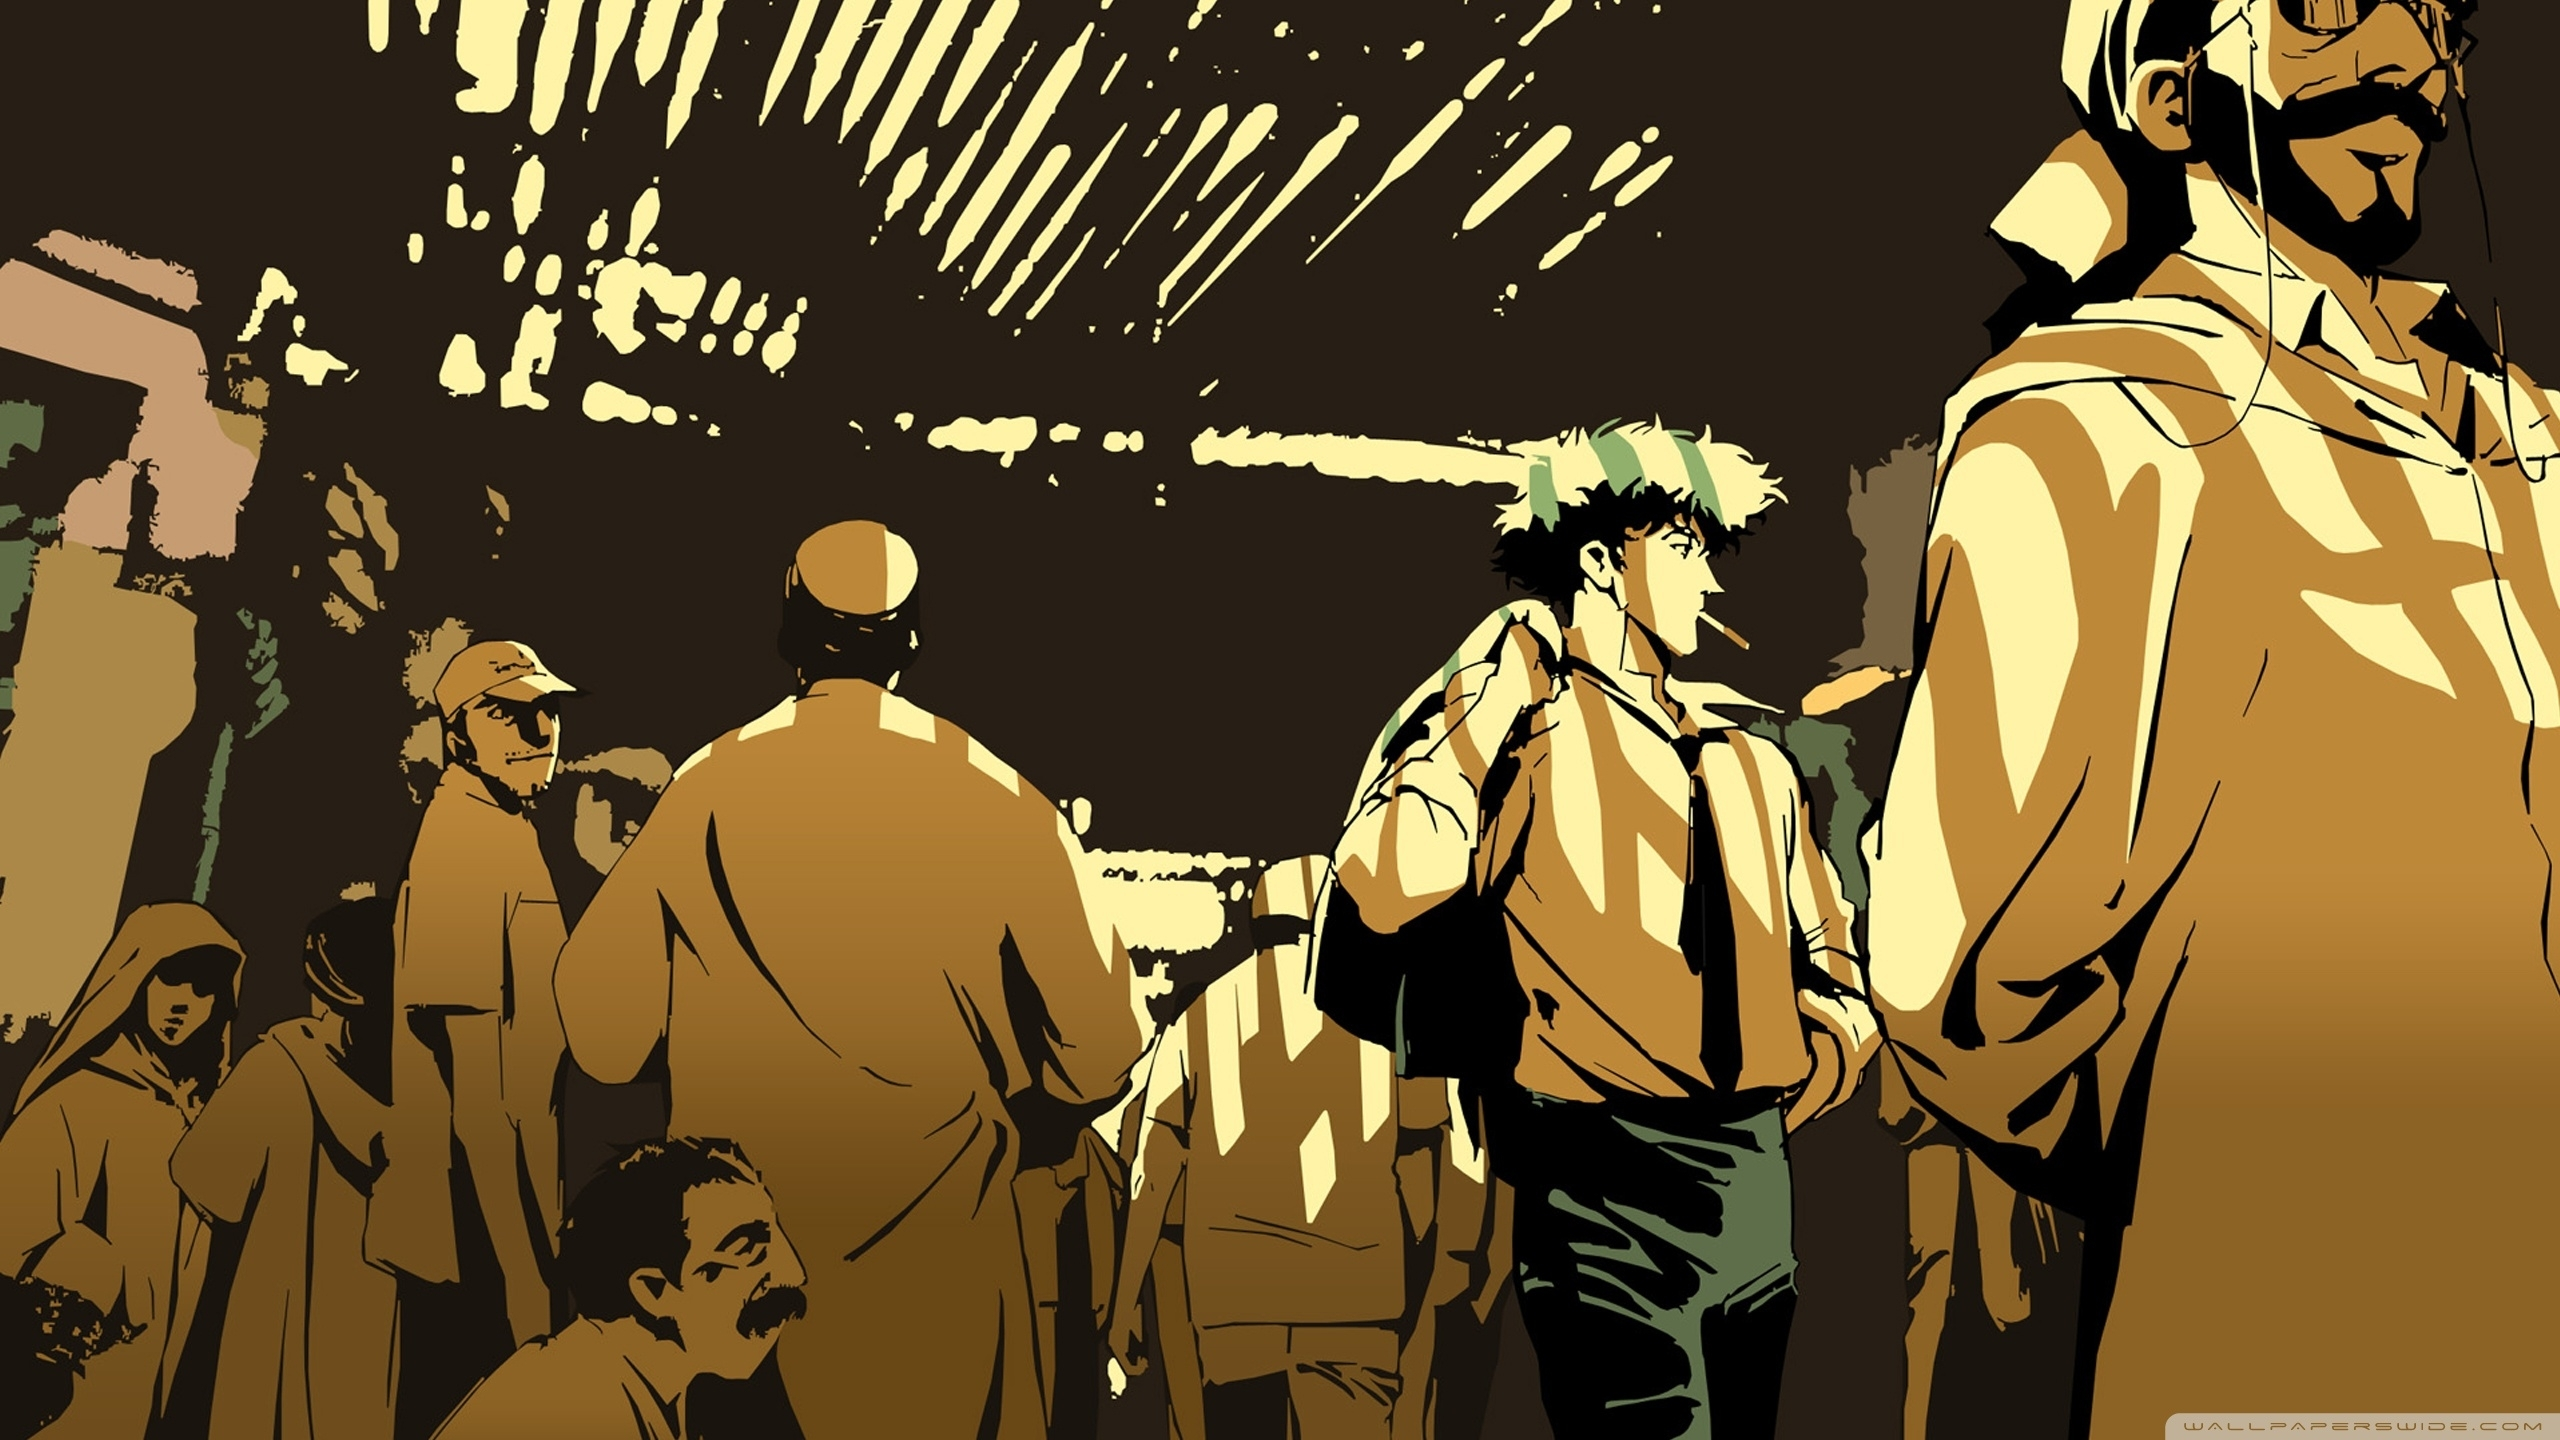 cowboy bebop - crowd ❤ 4k hd desktop wallpaper for 4k ultra hd tv